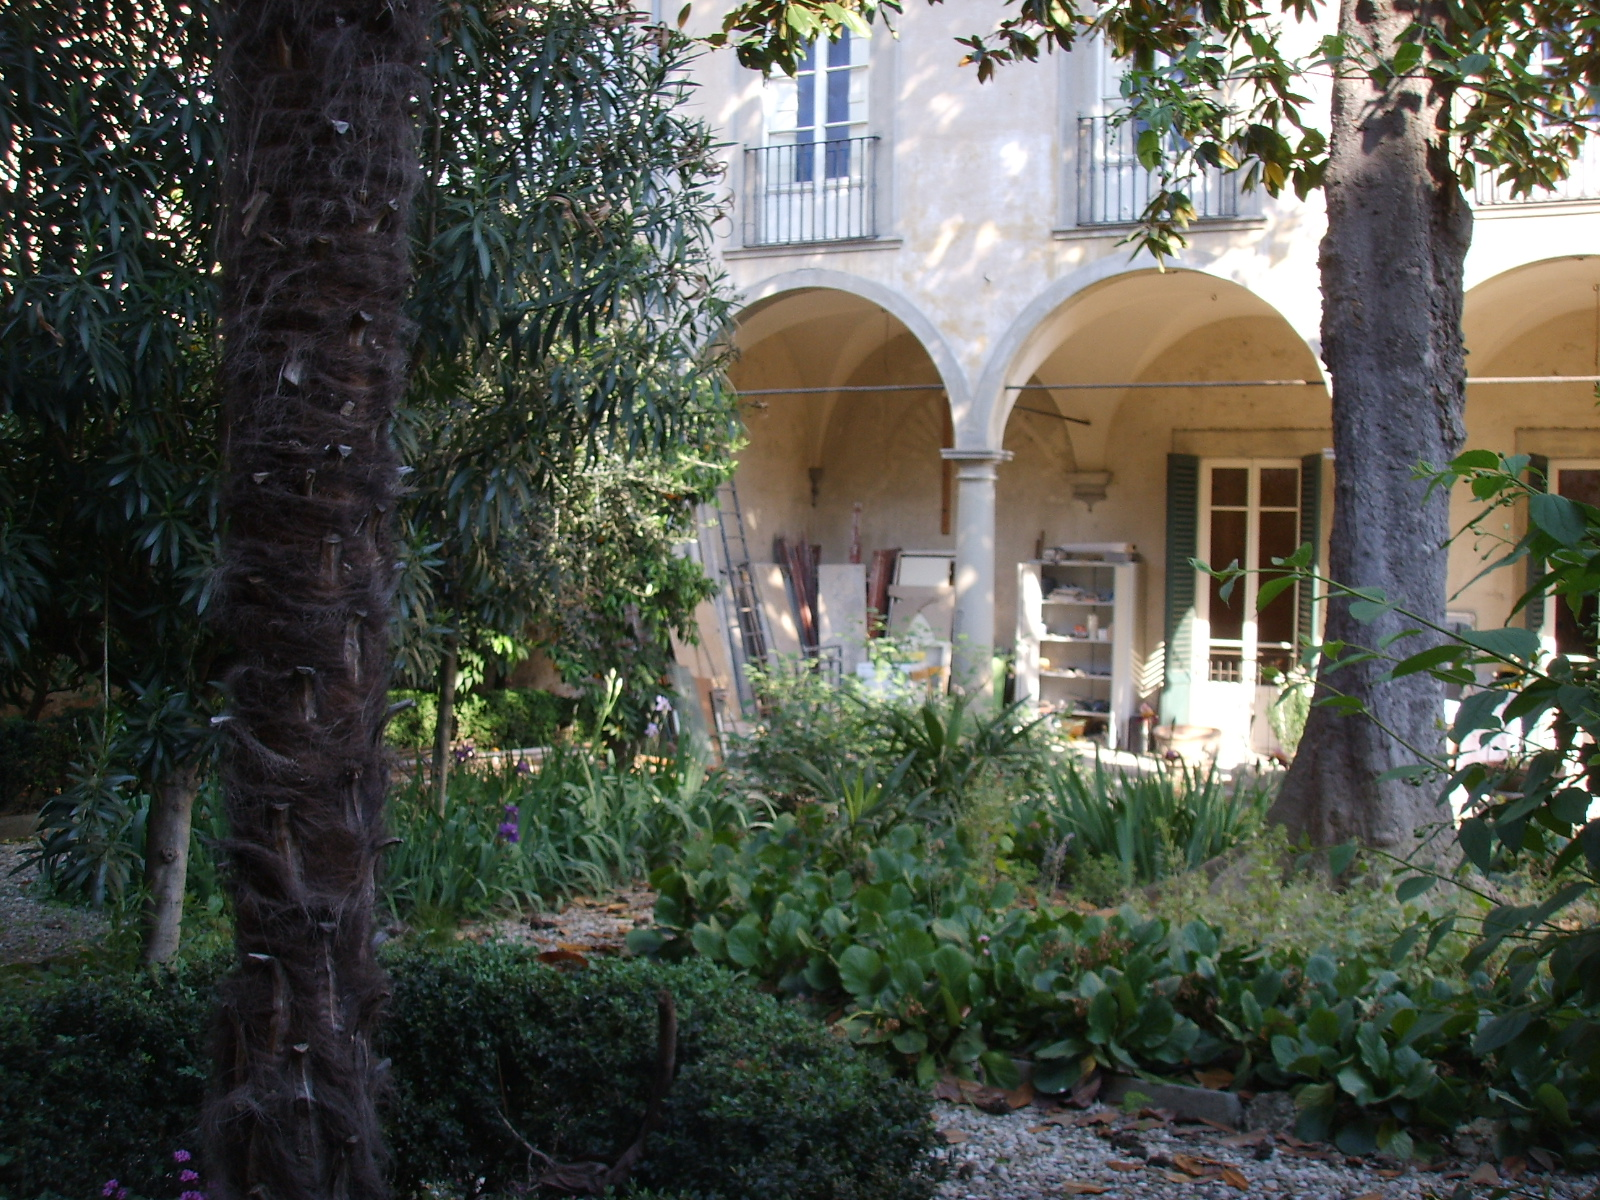 Palazzo_Roffia_giardino_03.JPG